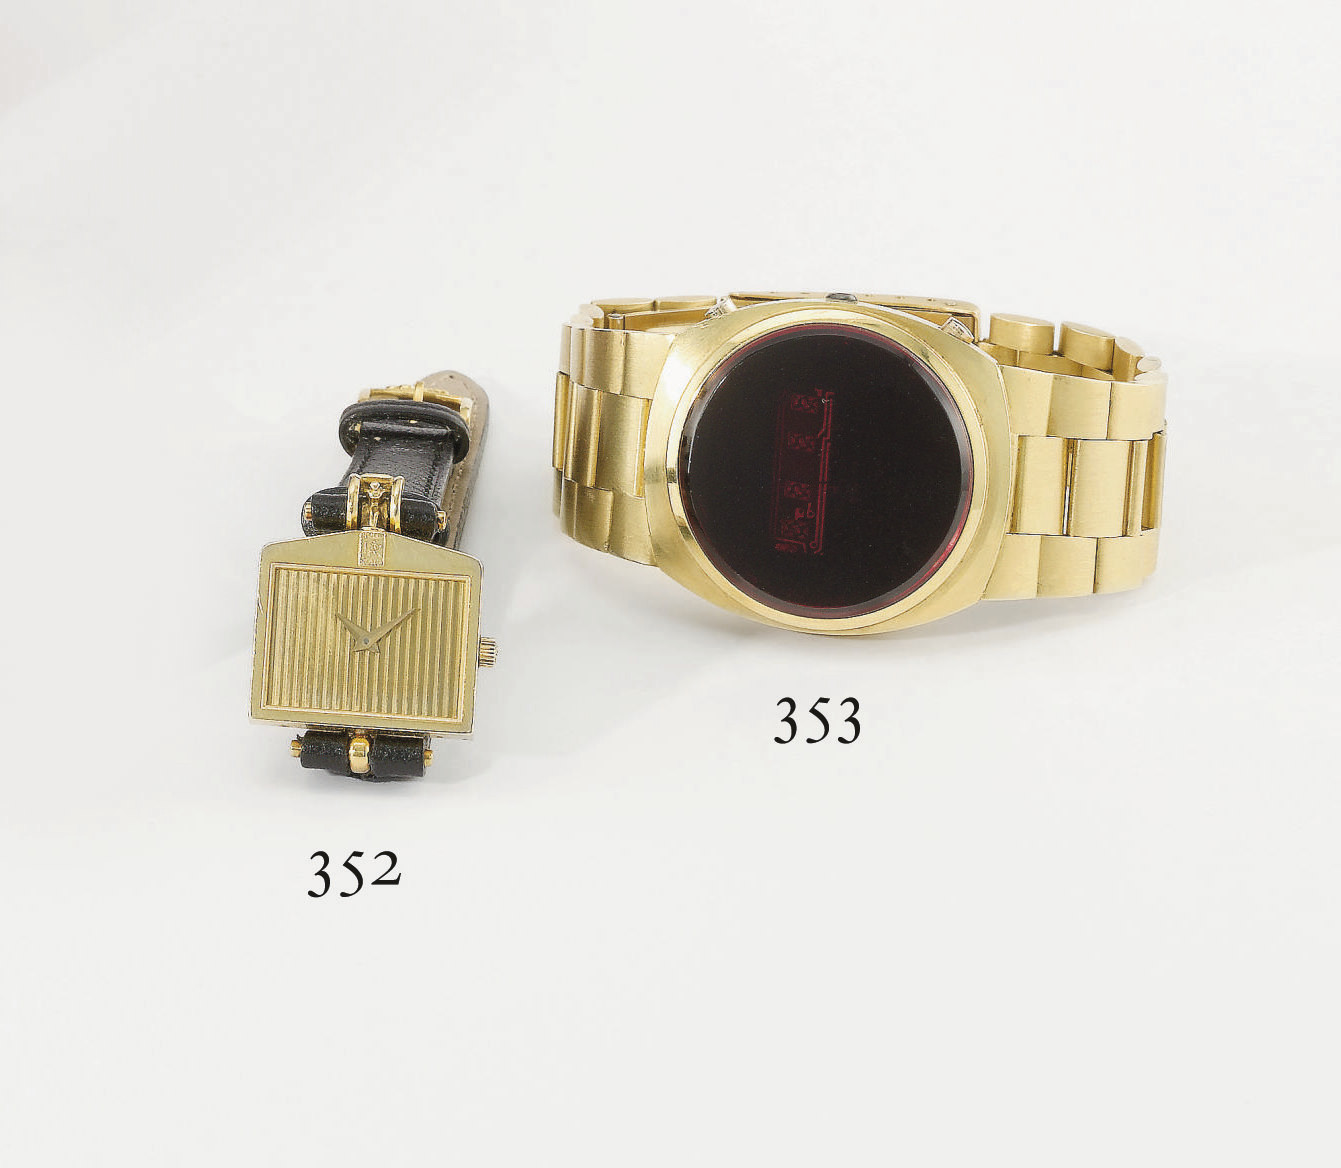 Swiss. An unusual and early 18K gold tonneau-shaped digital wristwatch with bracelet